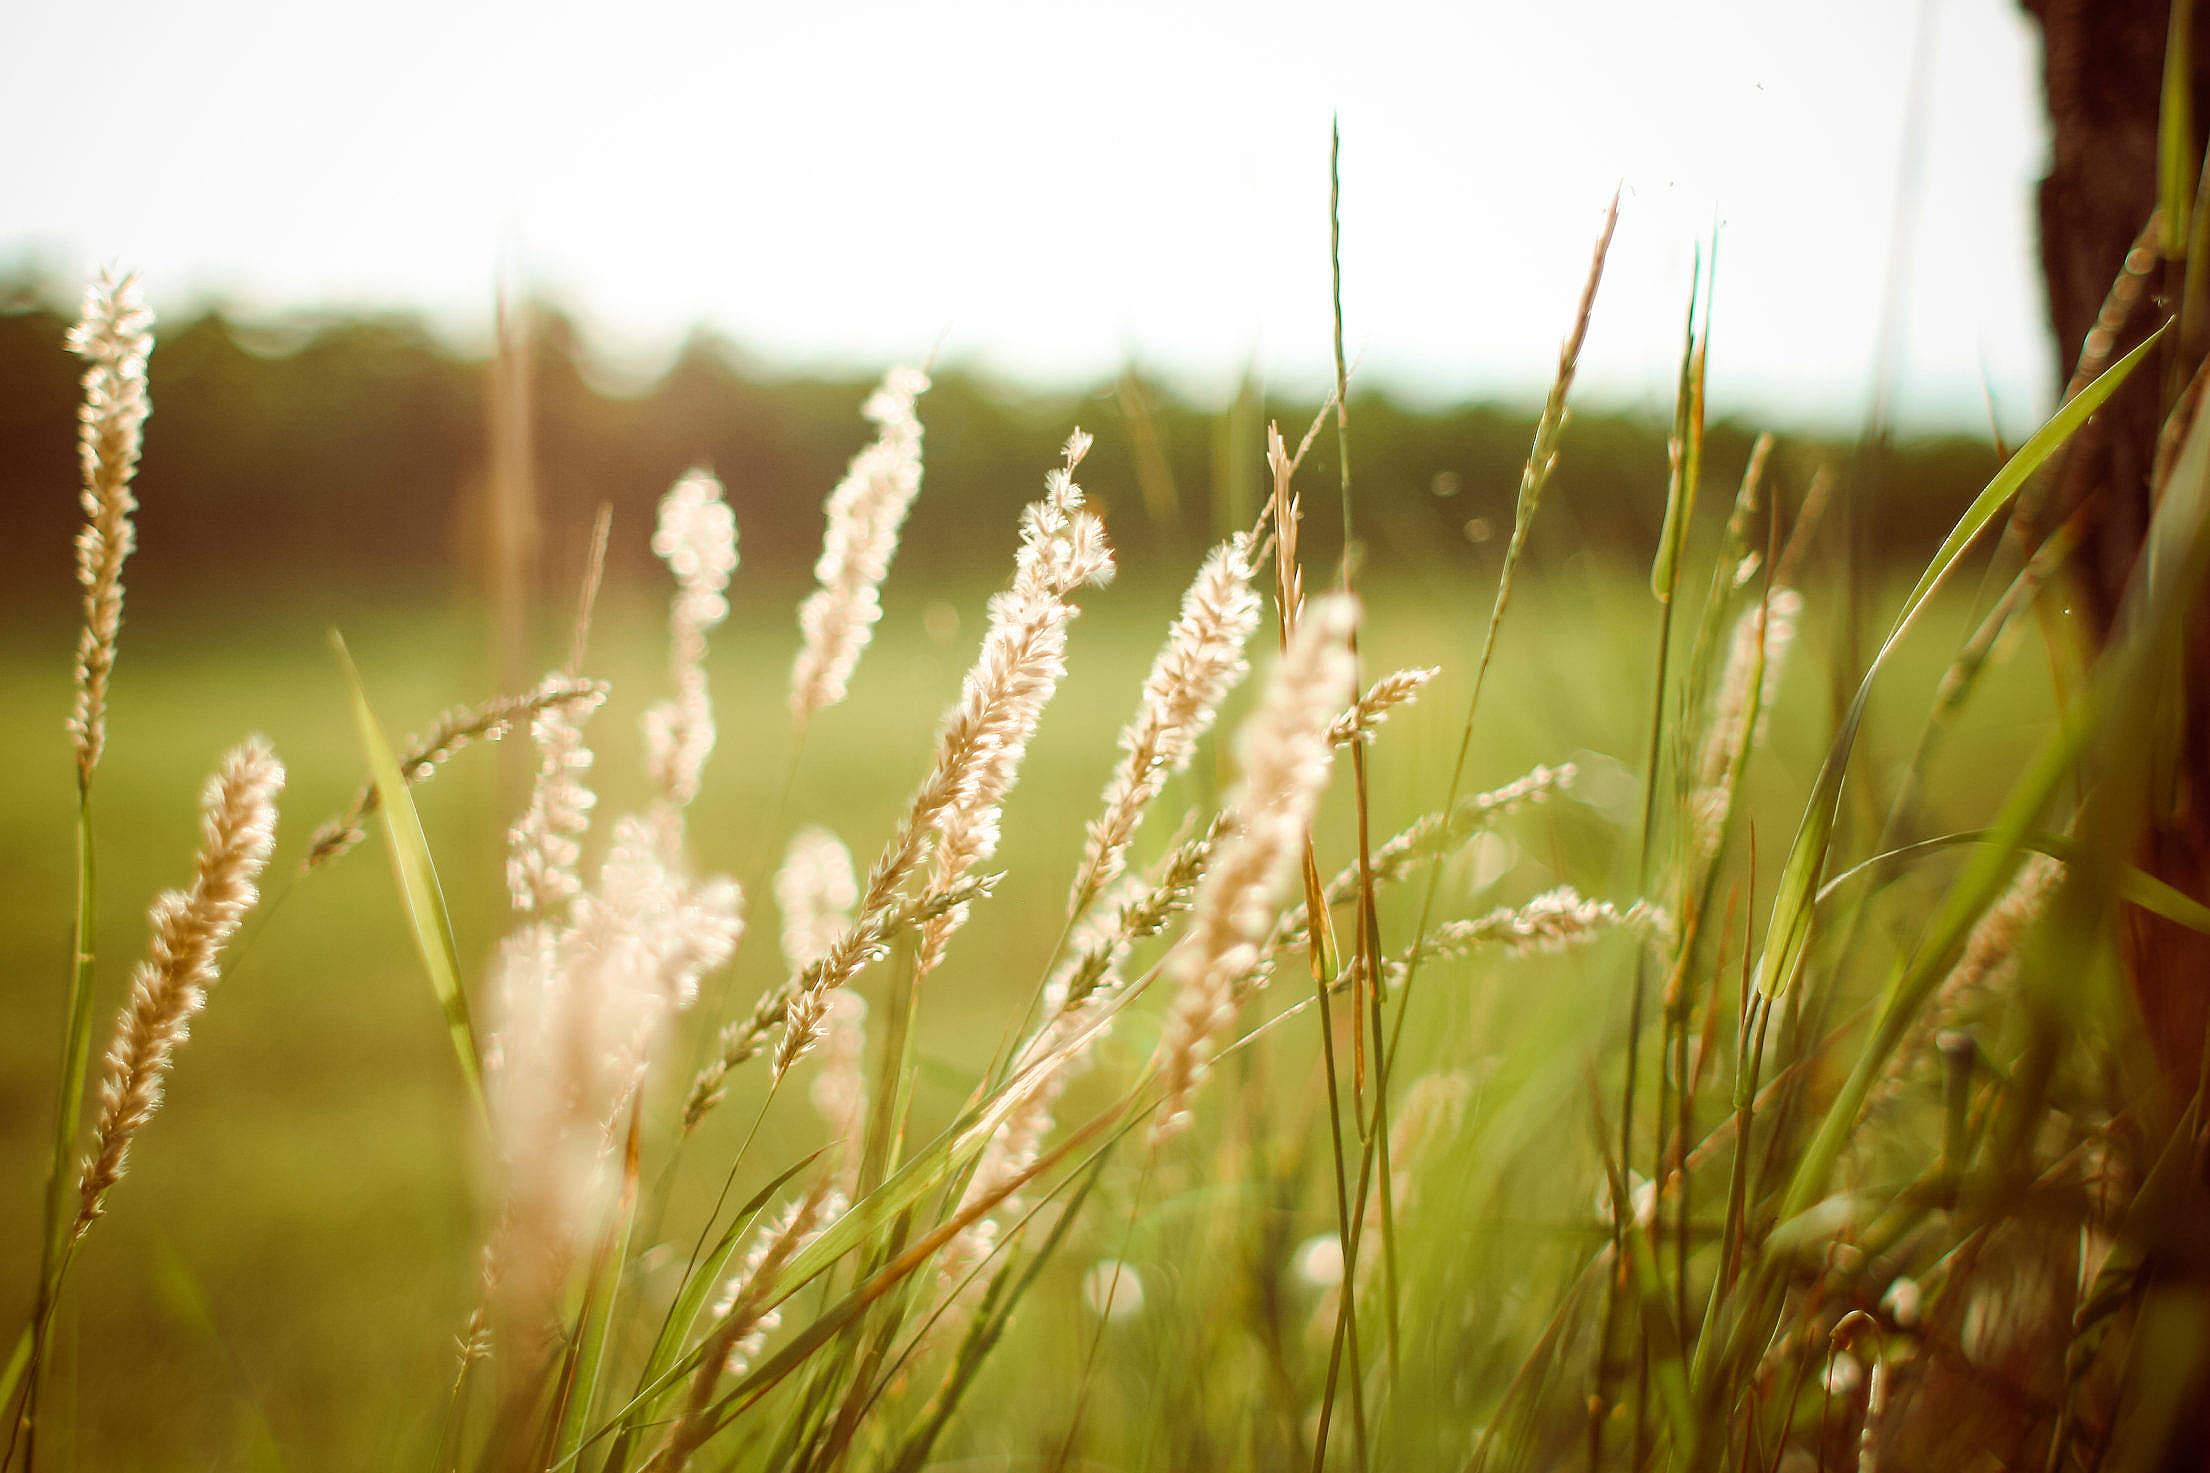 Sunset Grass Free Stock Photo